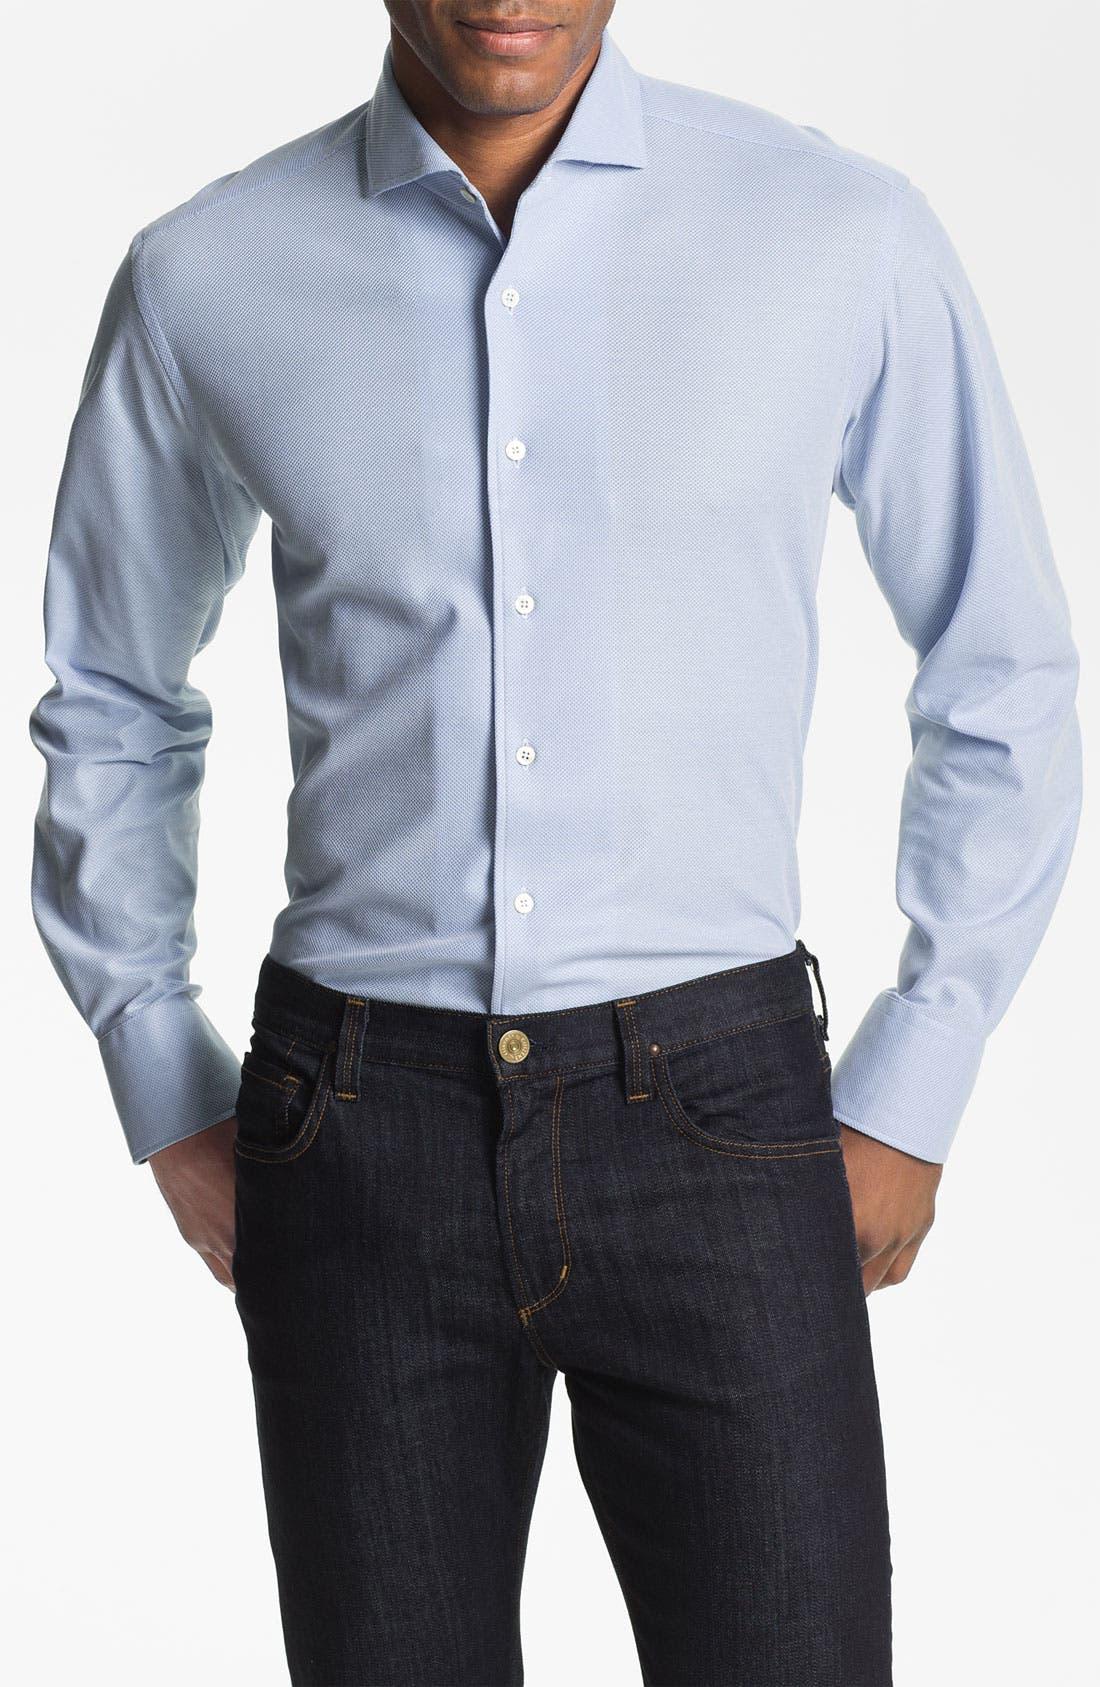 Main Image - Canali Regular Fit Knit Italian Sport Shirt